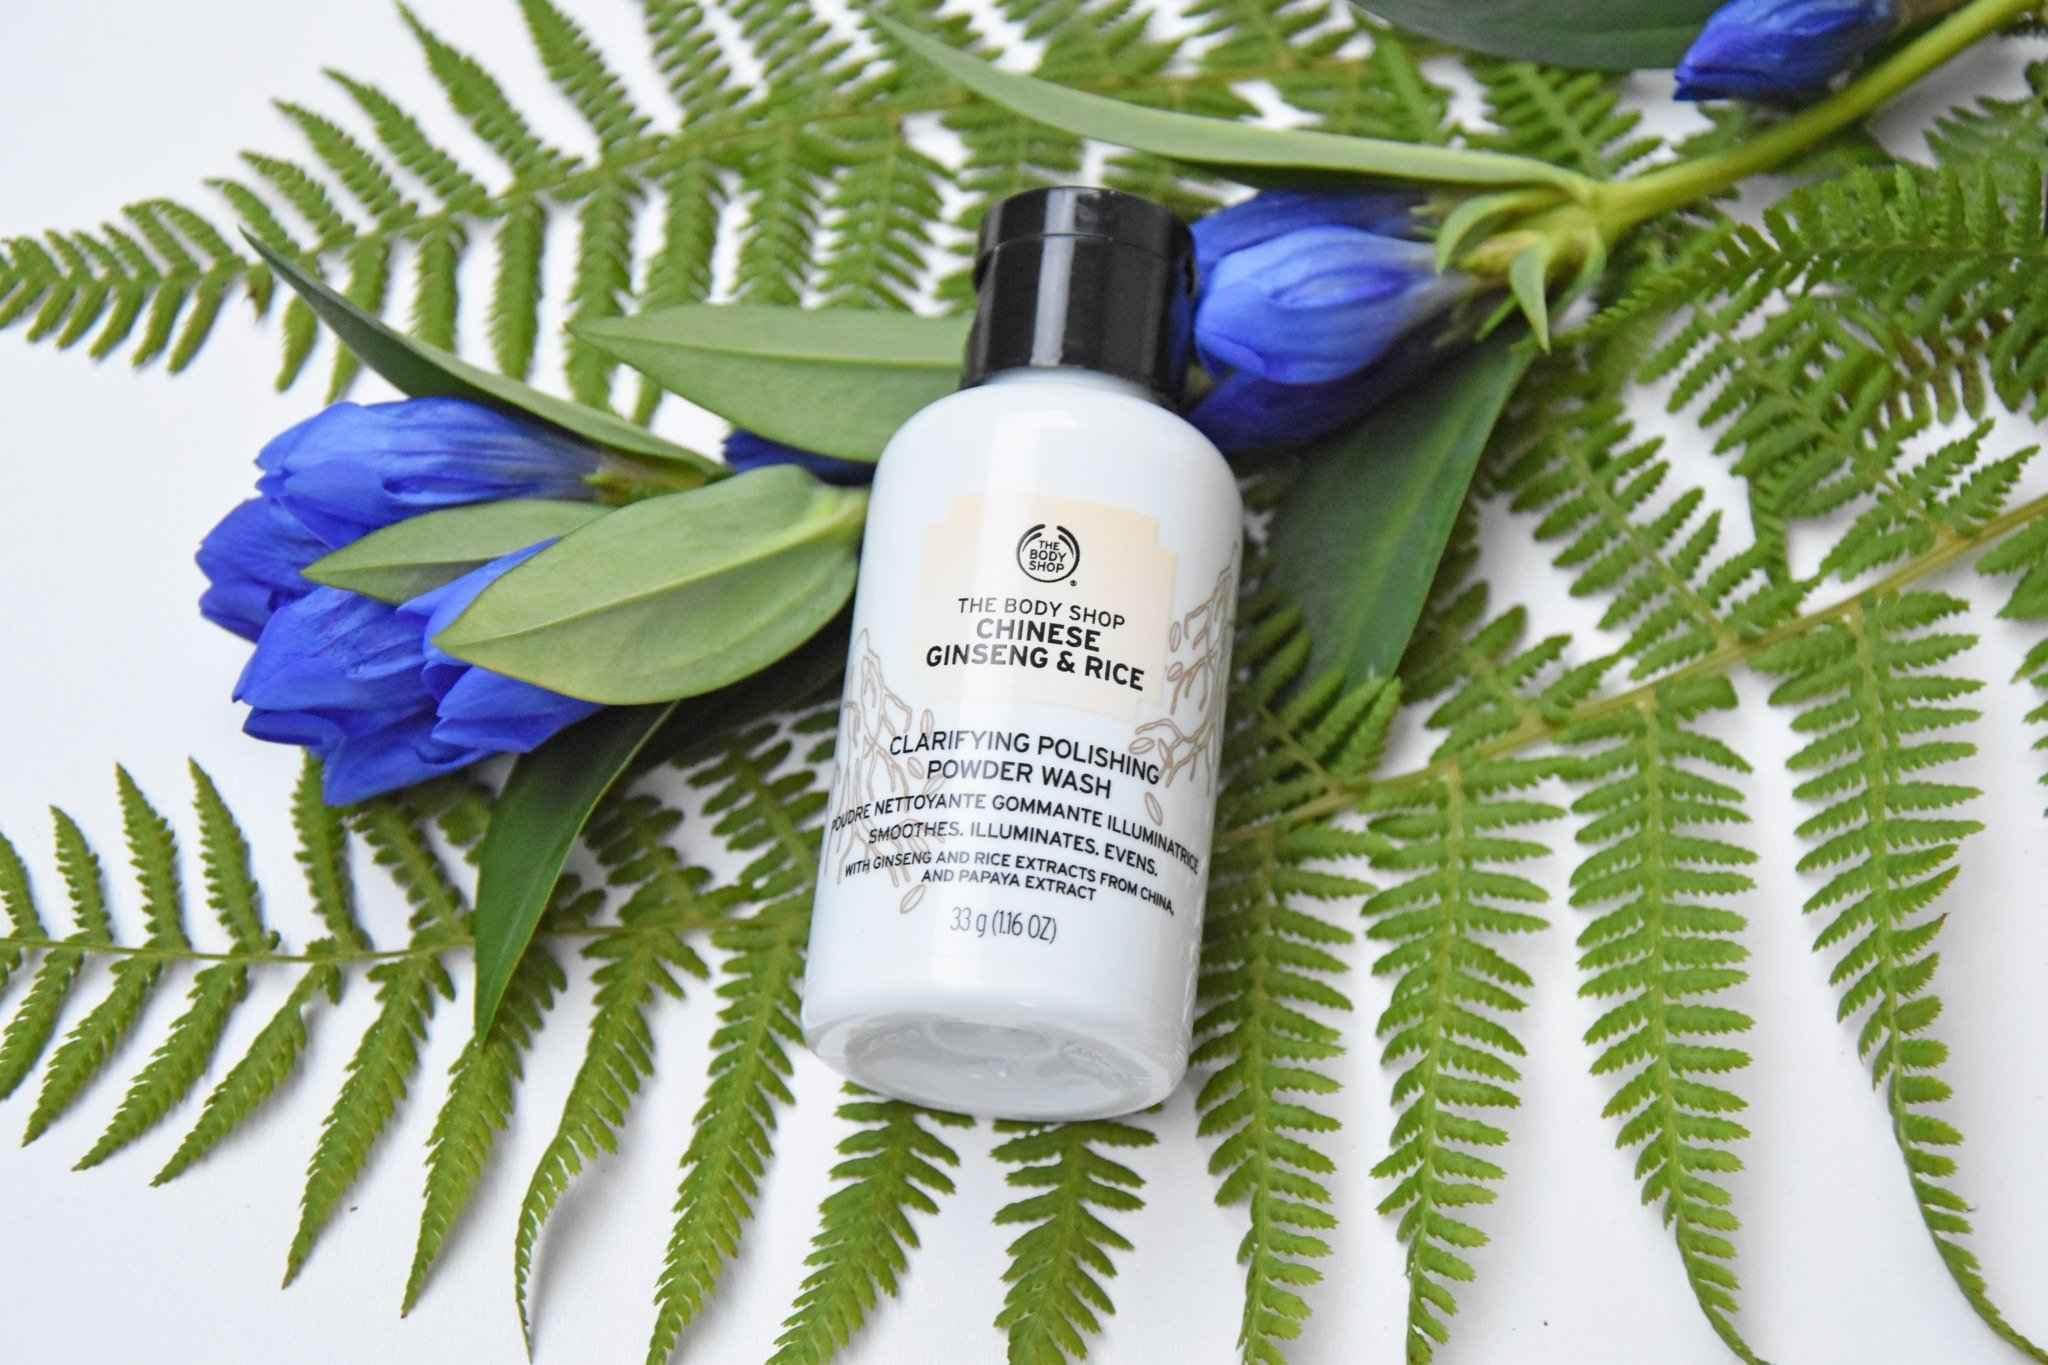 The Body Shop - Chinese Ginseng & Rice Clarifying Powder Wash